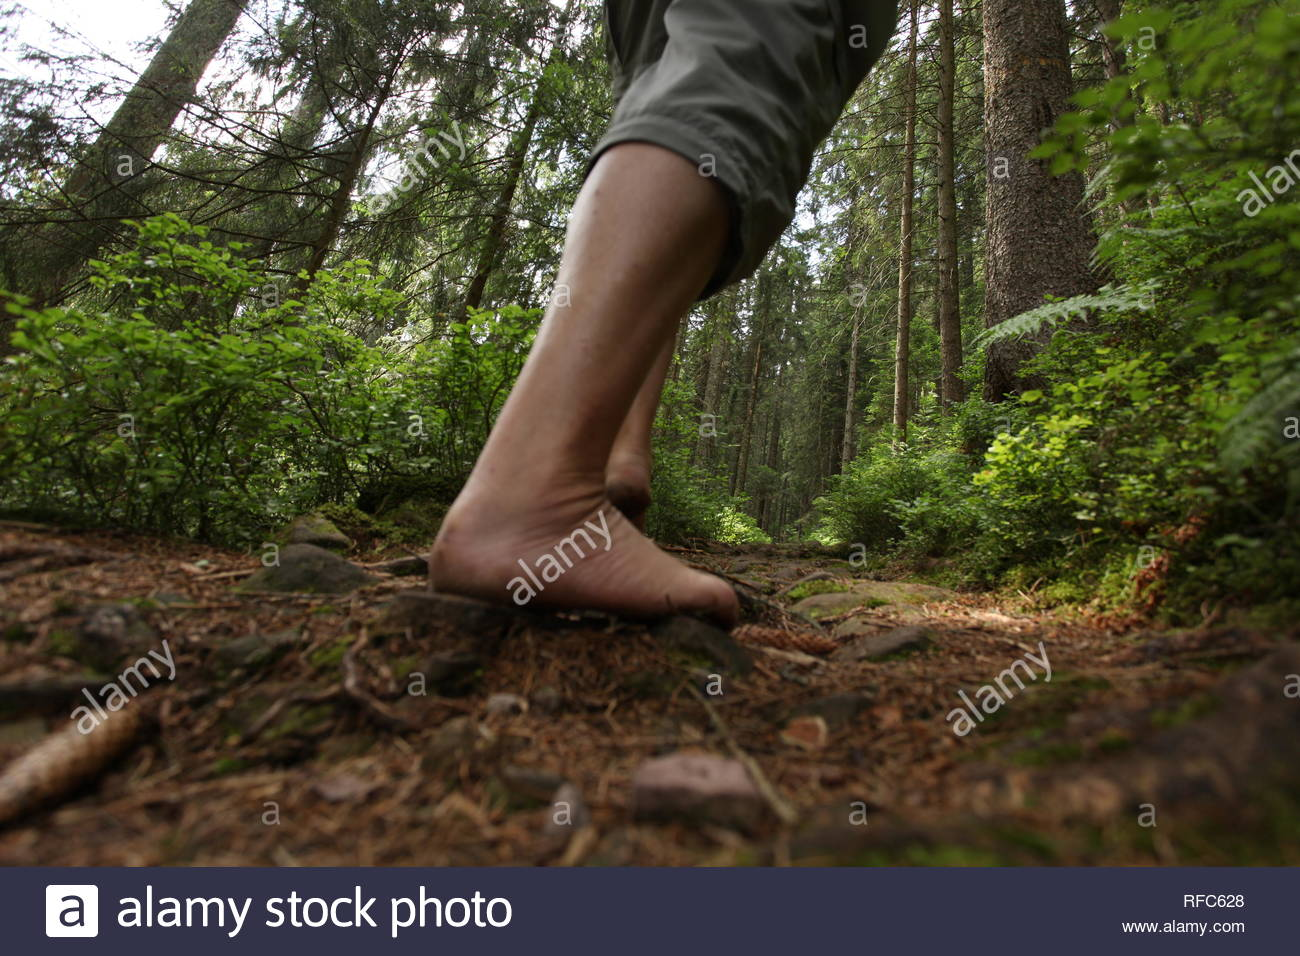 Barfuss gehen in der Natur, barfuss wandern - Stock Image